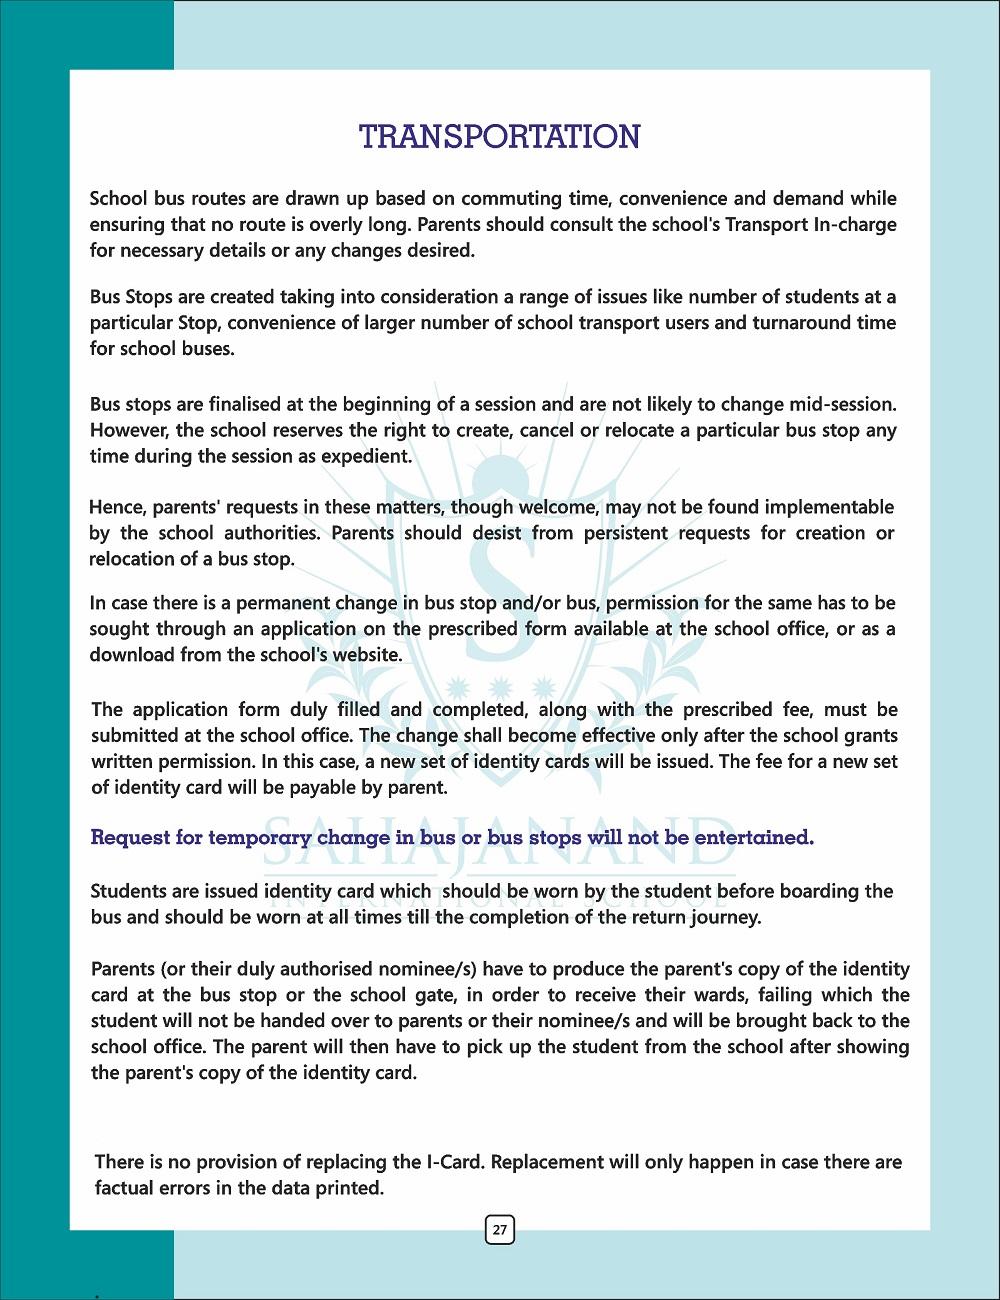 Transportation rule – Sahajanand International School